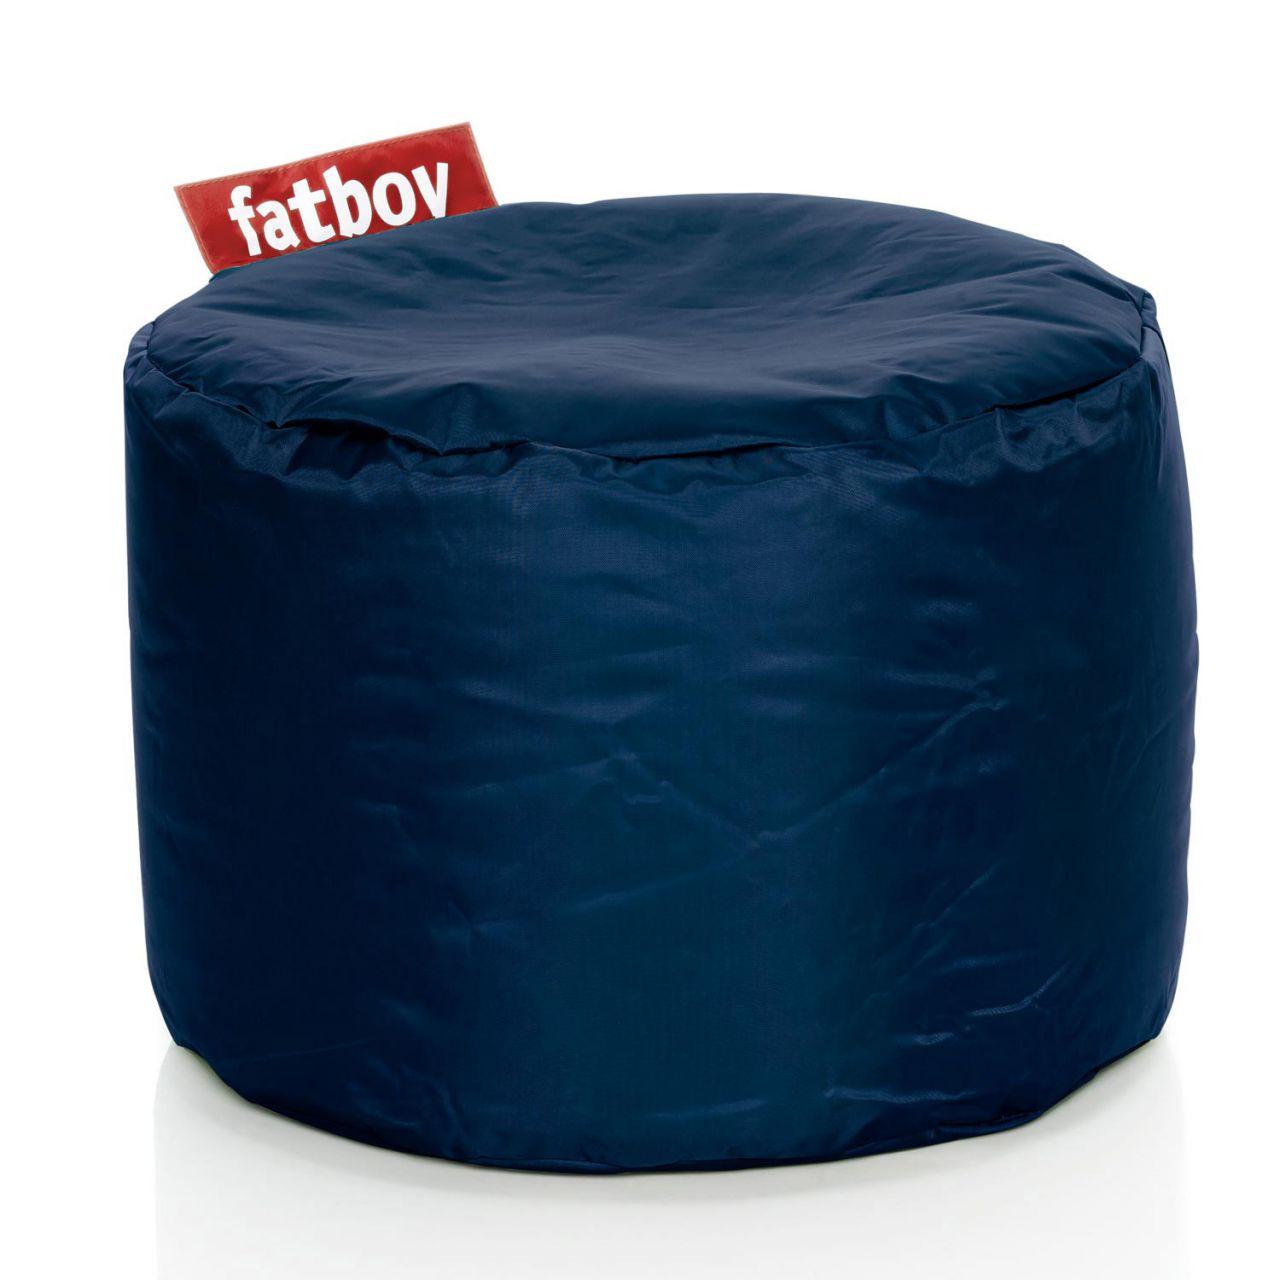 Fatboy - Point Sitzhocker 900.0034